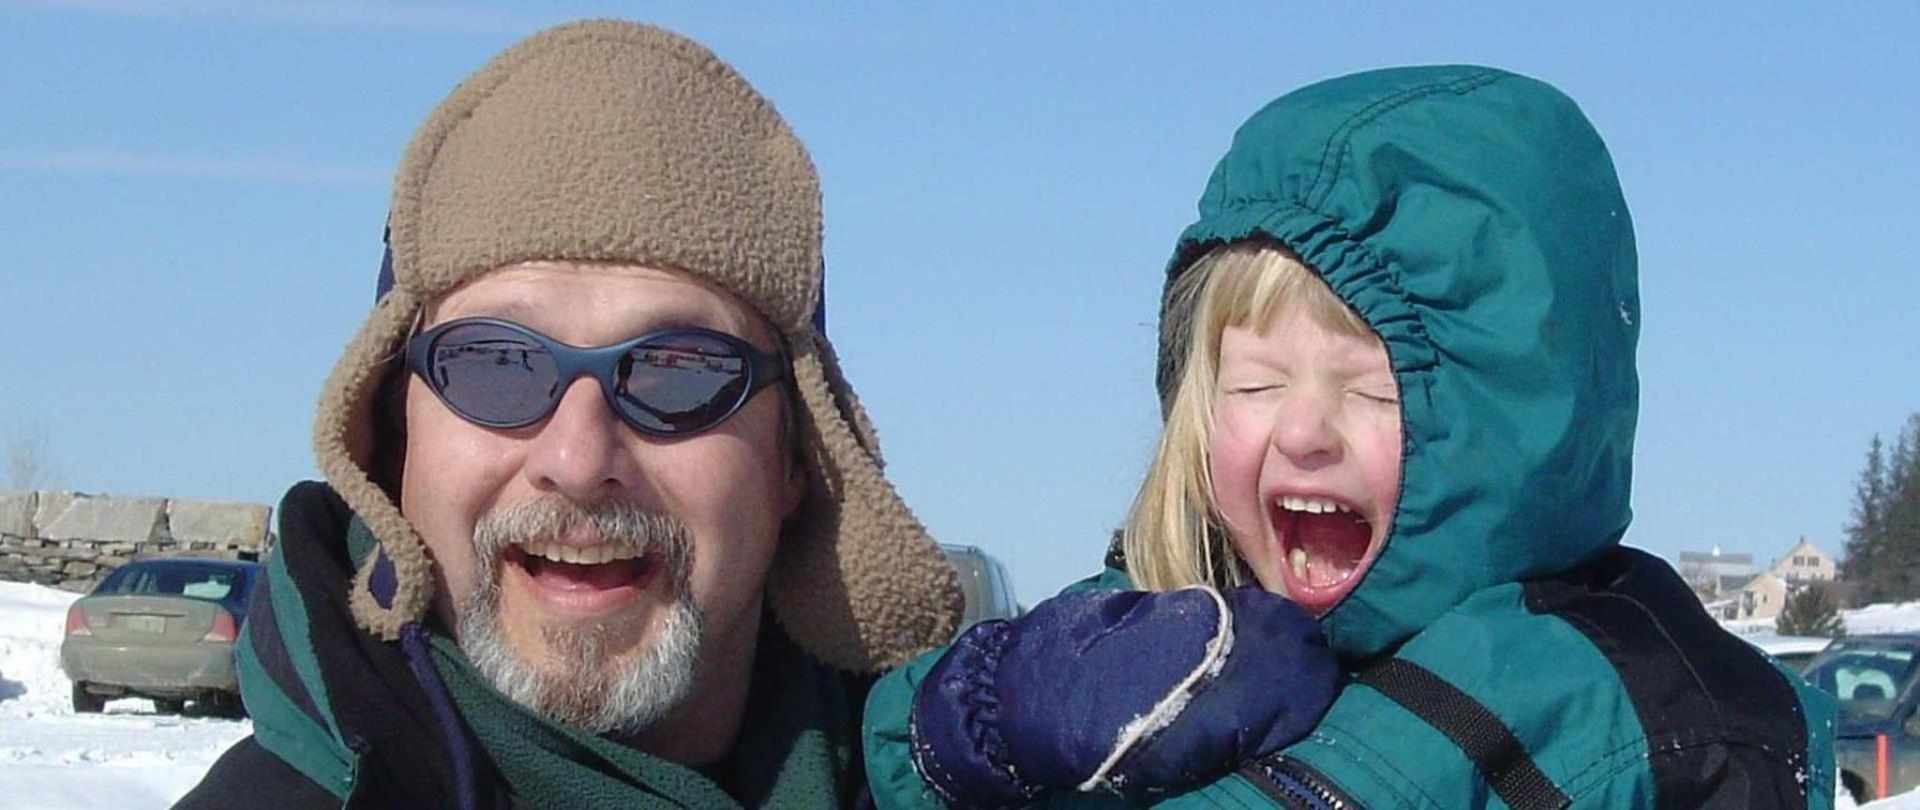 dadanddaughterbig-smile.jpg.1920x810_0_225_11162.jpeg.1920x0.jpeg